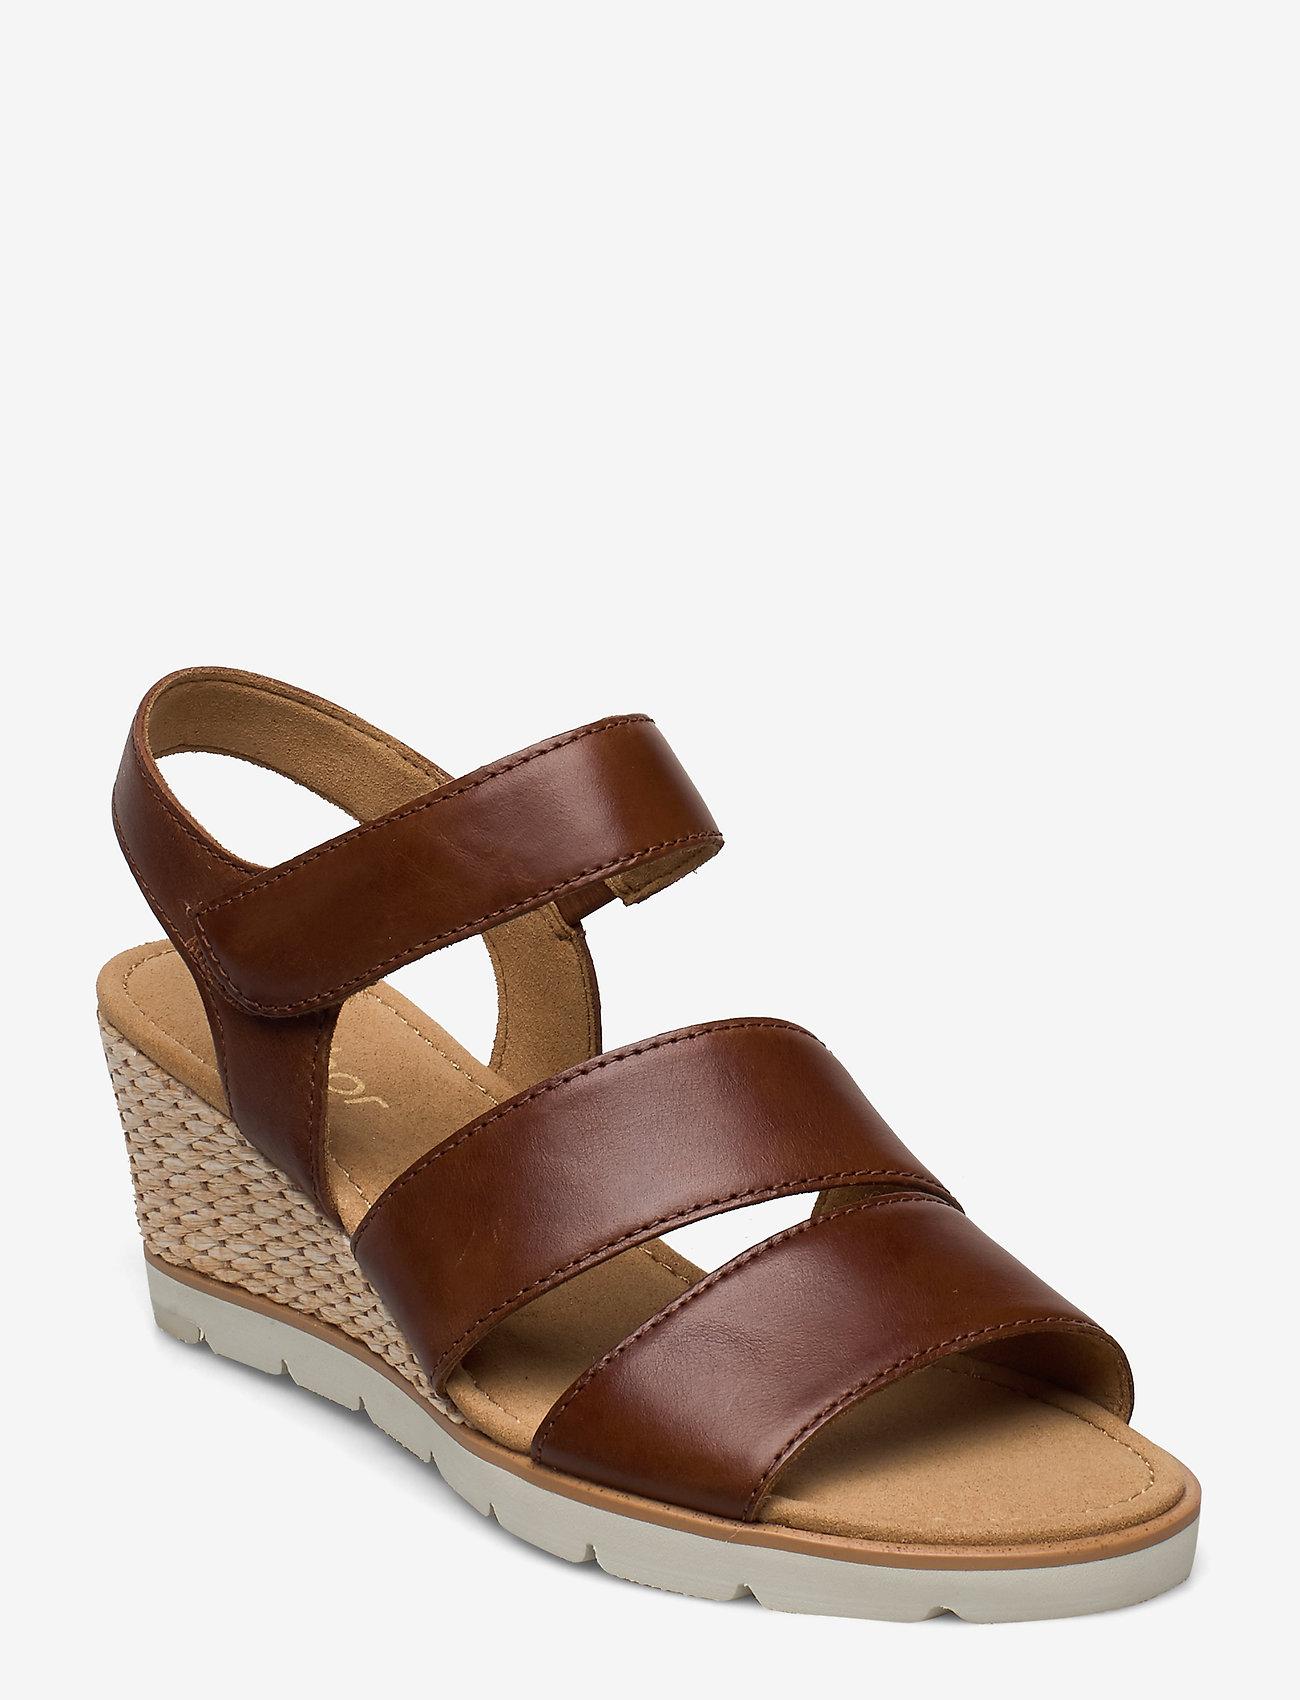 Gabor - sandals - espadrilles met sleehak - brown - 0